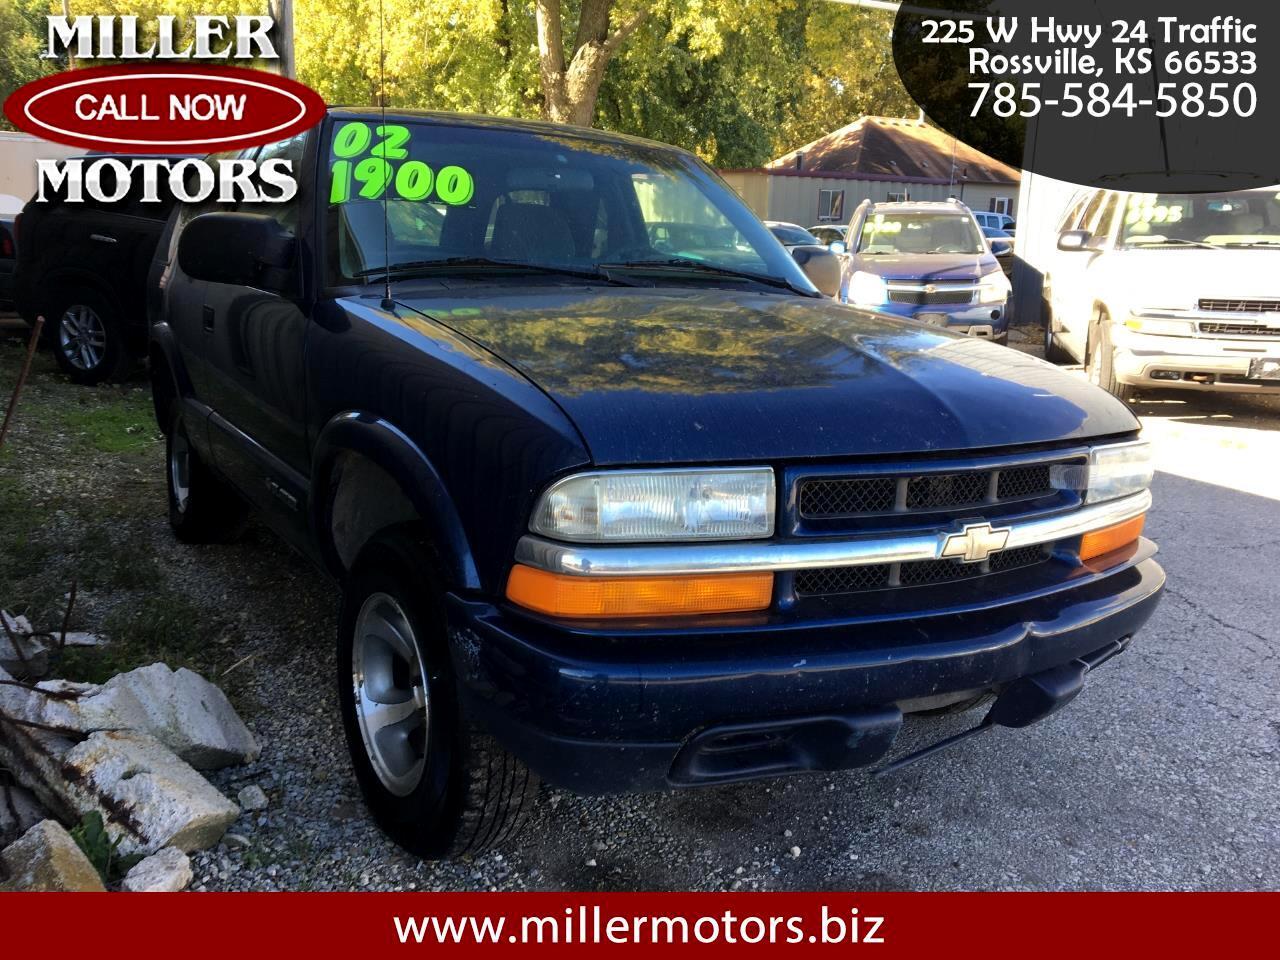 2002 Chevrolet Blazer 2dr LS